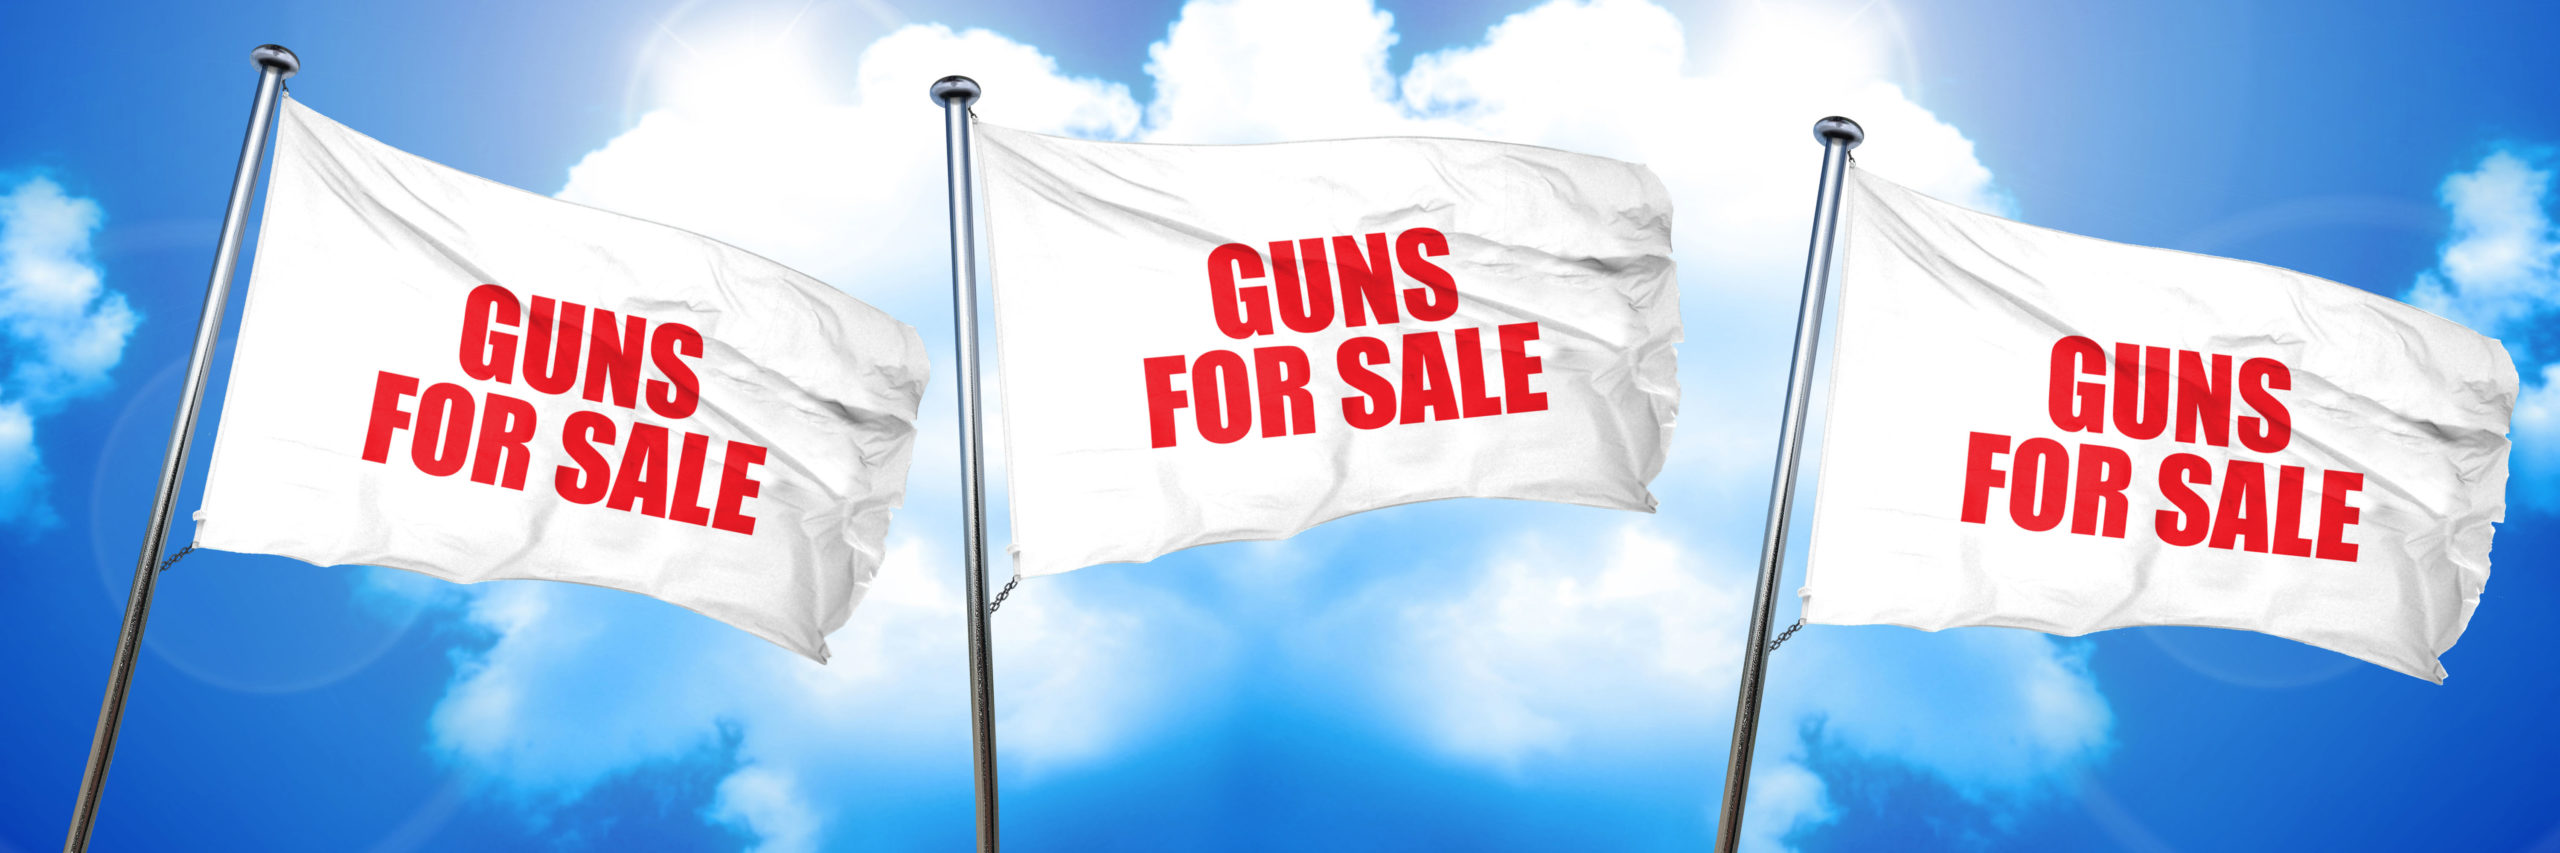 Gun Sales Merchant Account Credit Cards Gun Shop